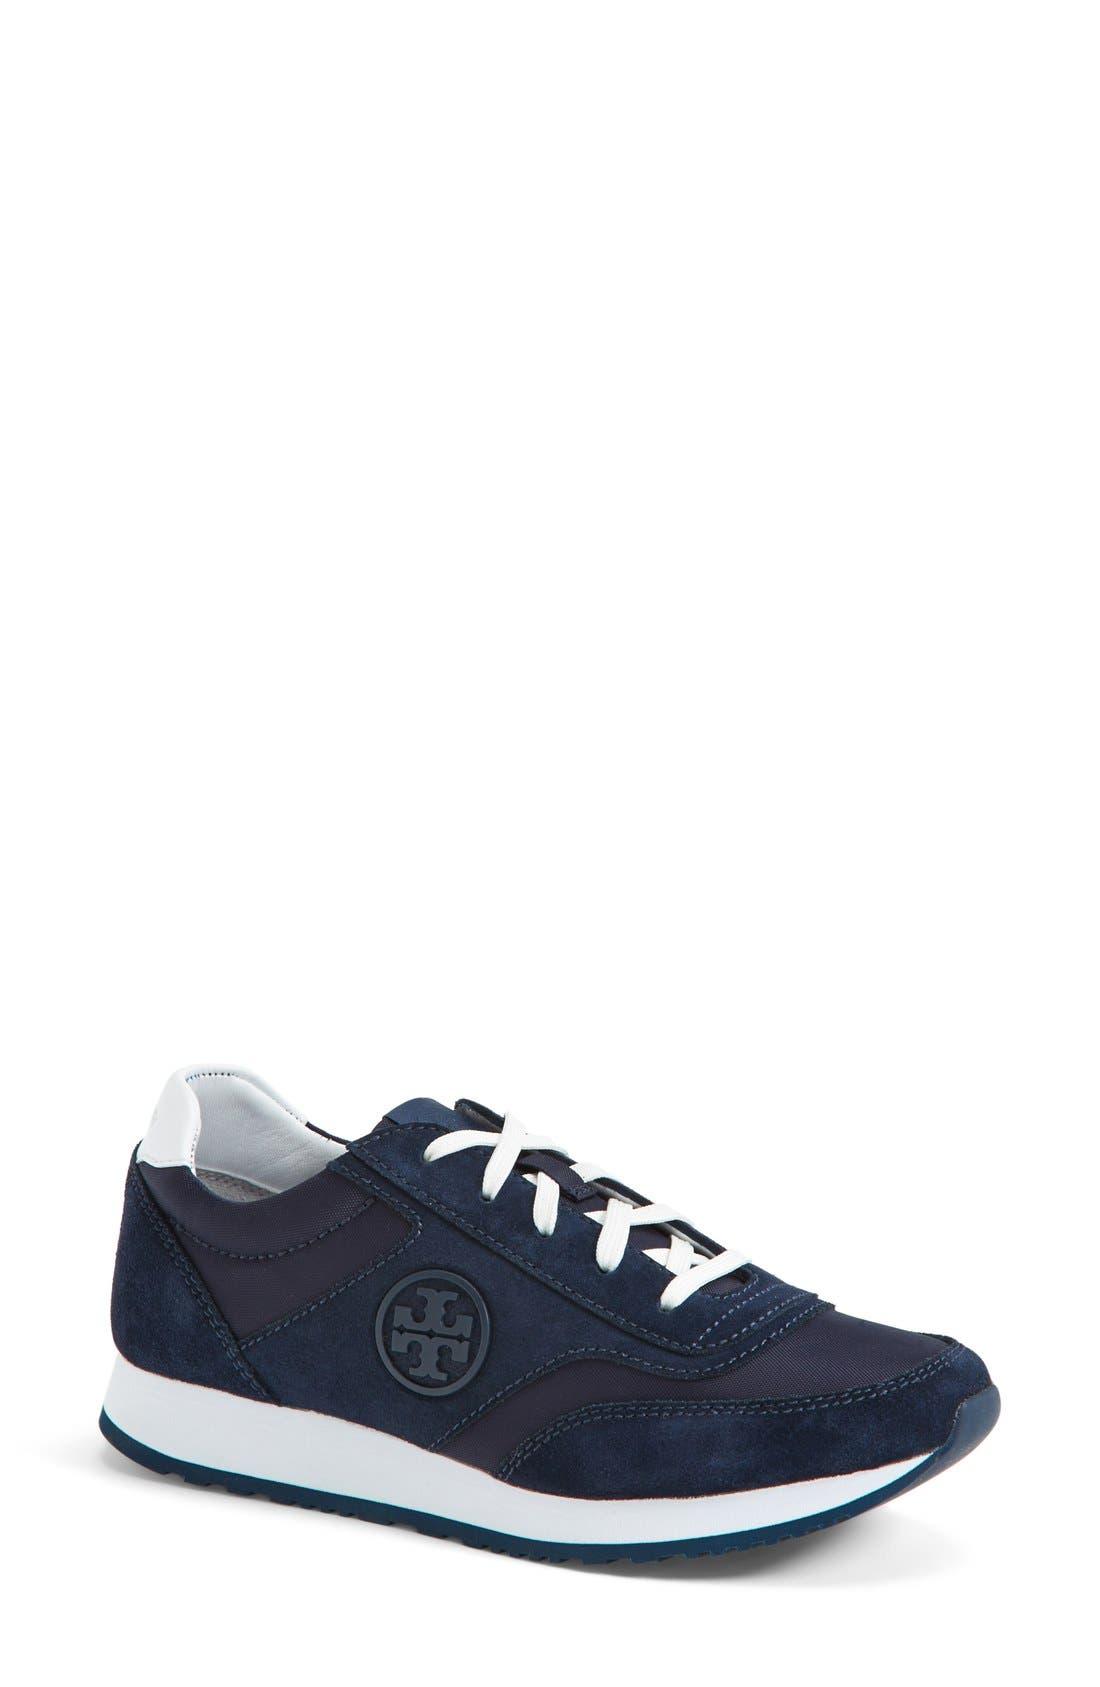 Alternate Image 1 Selected - Tory Burch Logo Sneaker (Women)